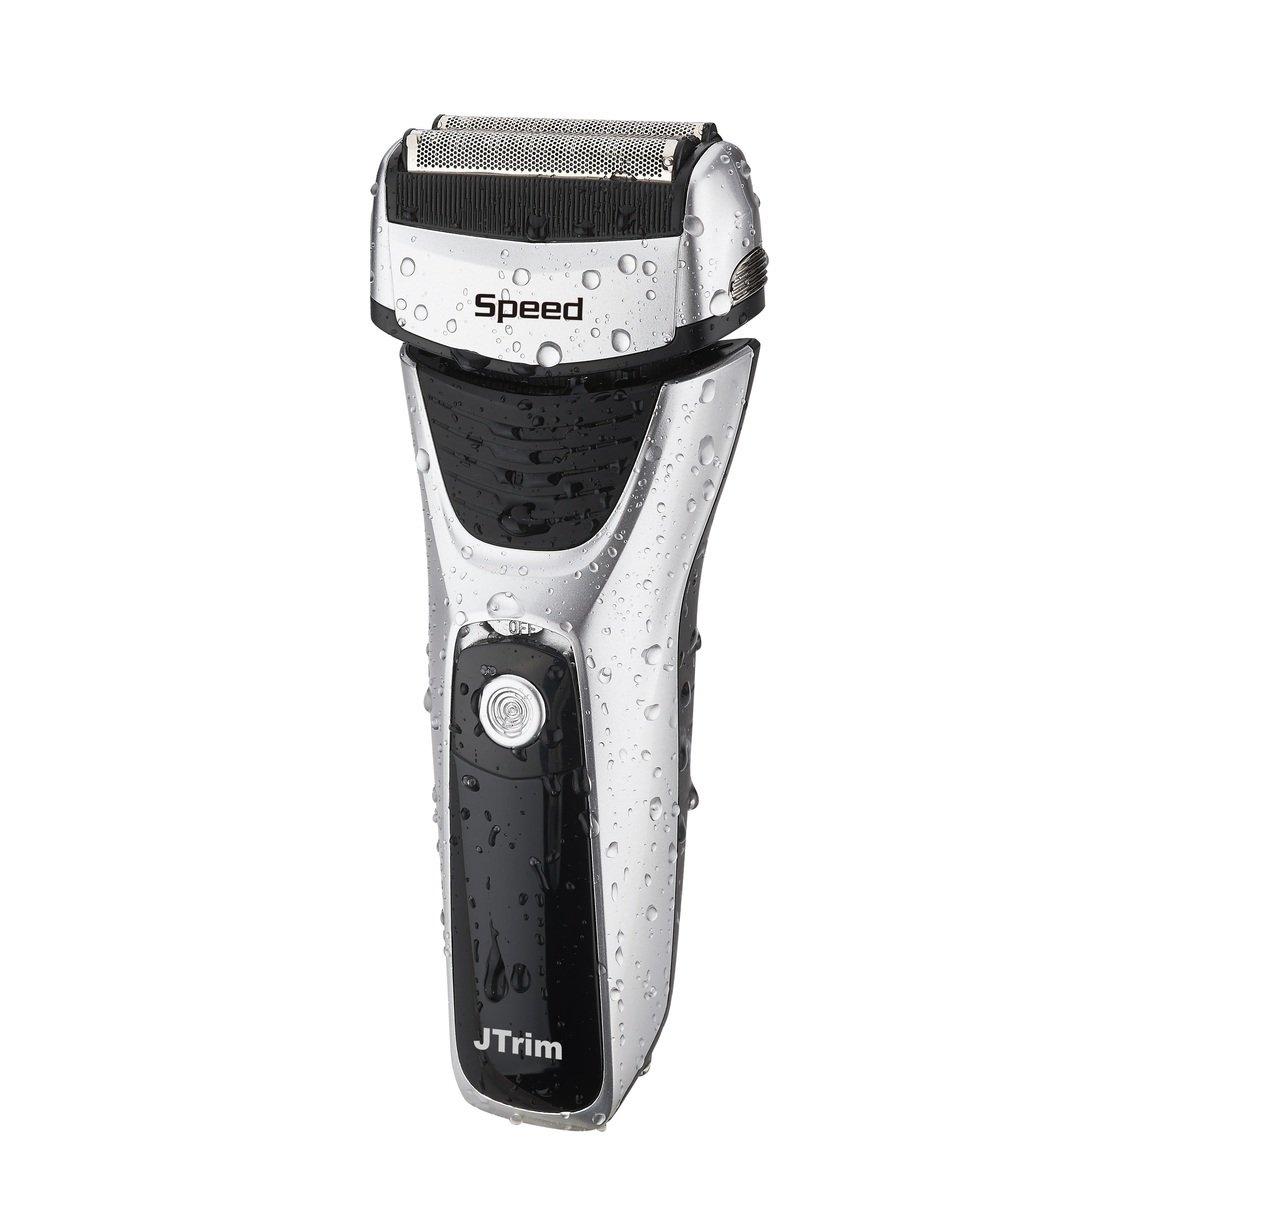 Best Electric Shaver For Men By JTrim Speed 3 Power Flex & Pivot 3 Blades Wet dry Foil Razor Jay's Products